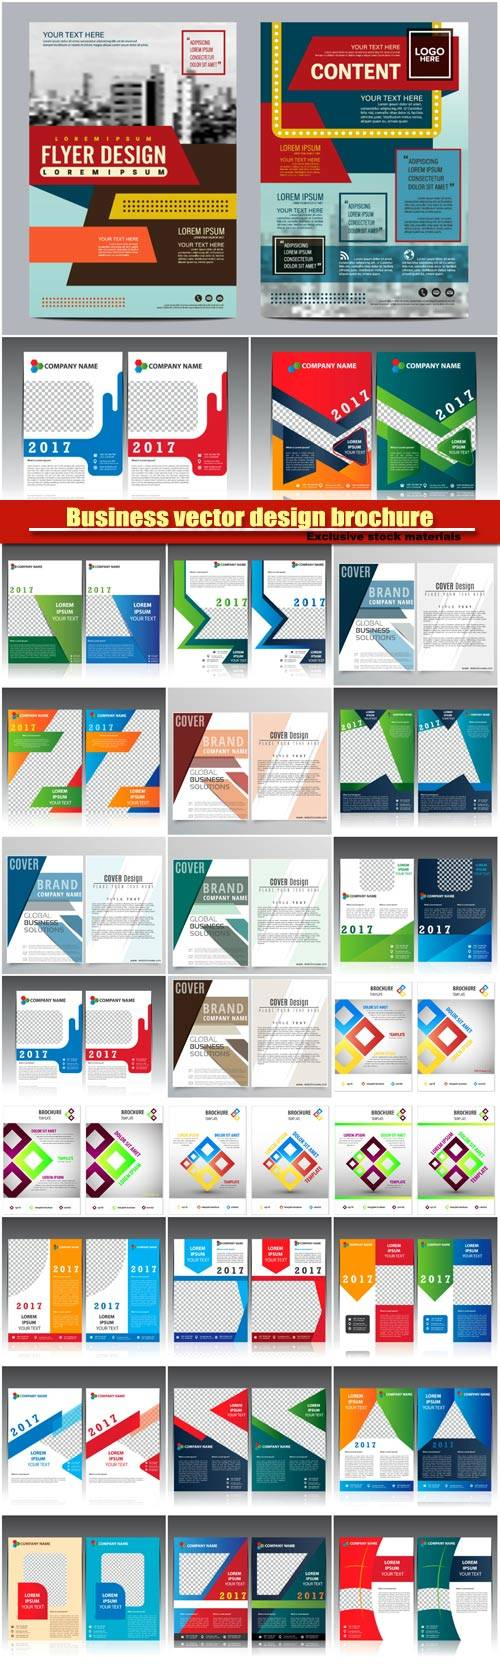 Business vector design brochure, creative flyer template